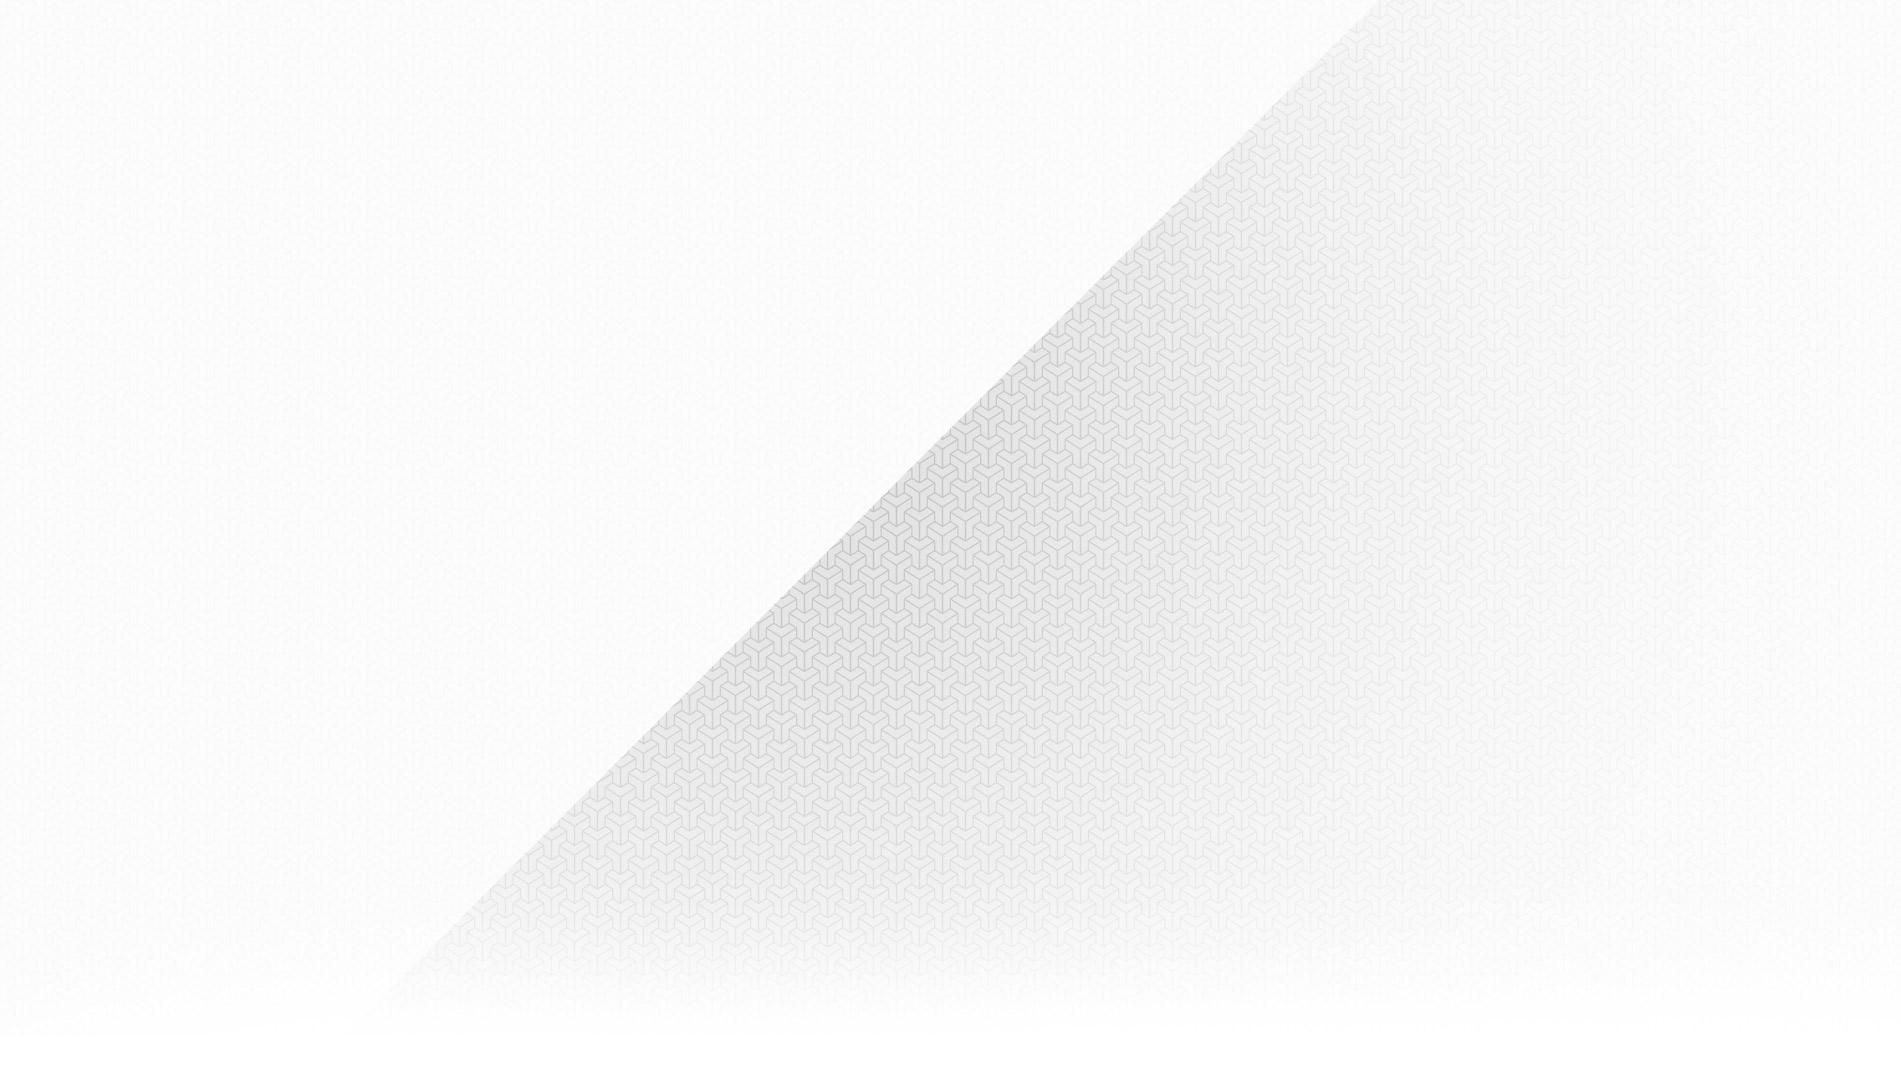 White 3d Background - WallpaperSafari